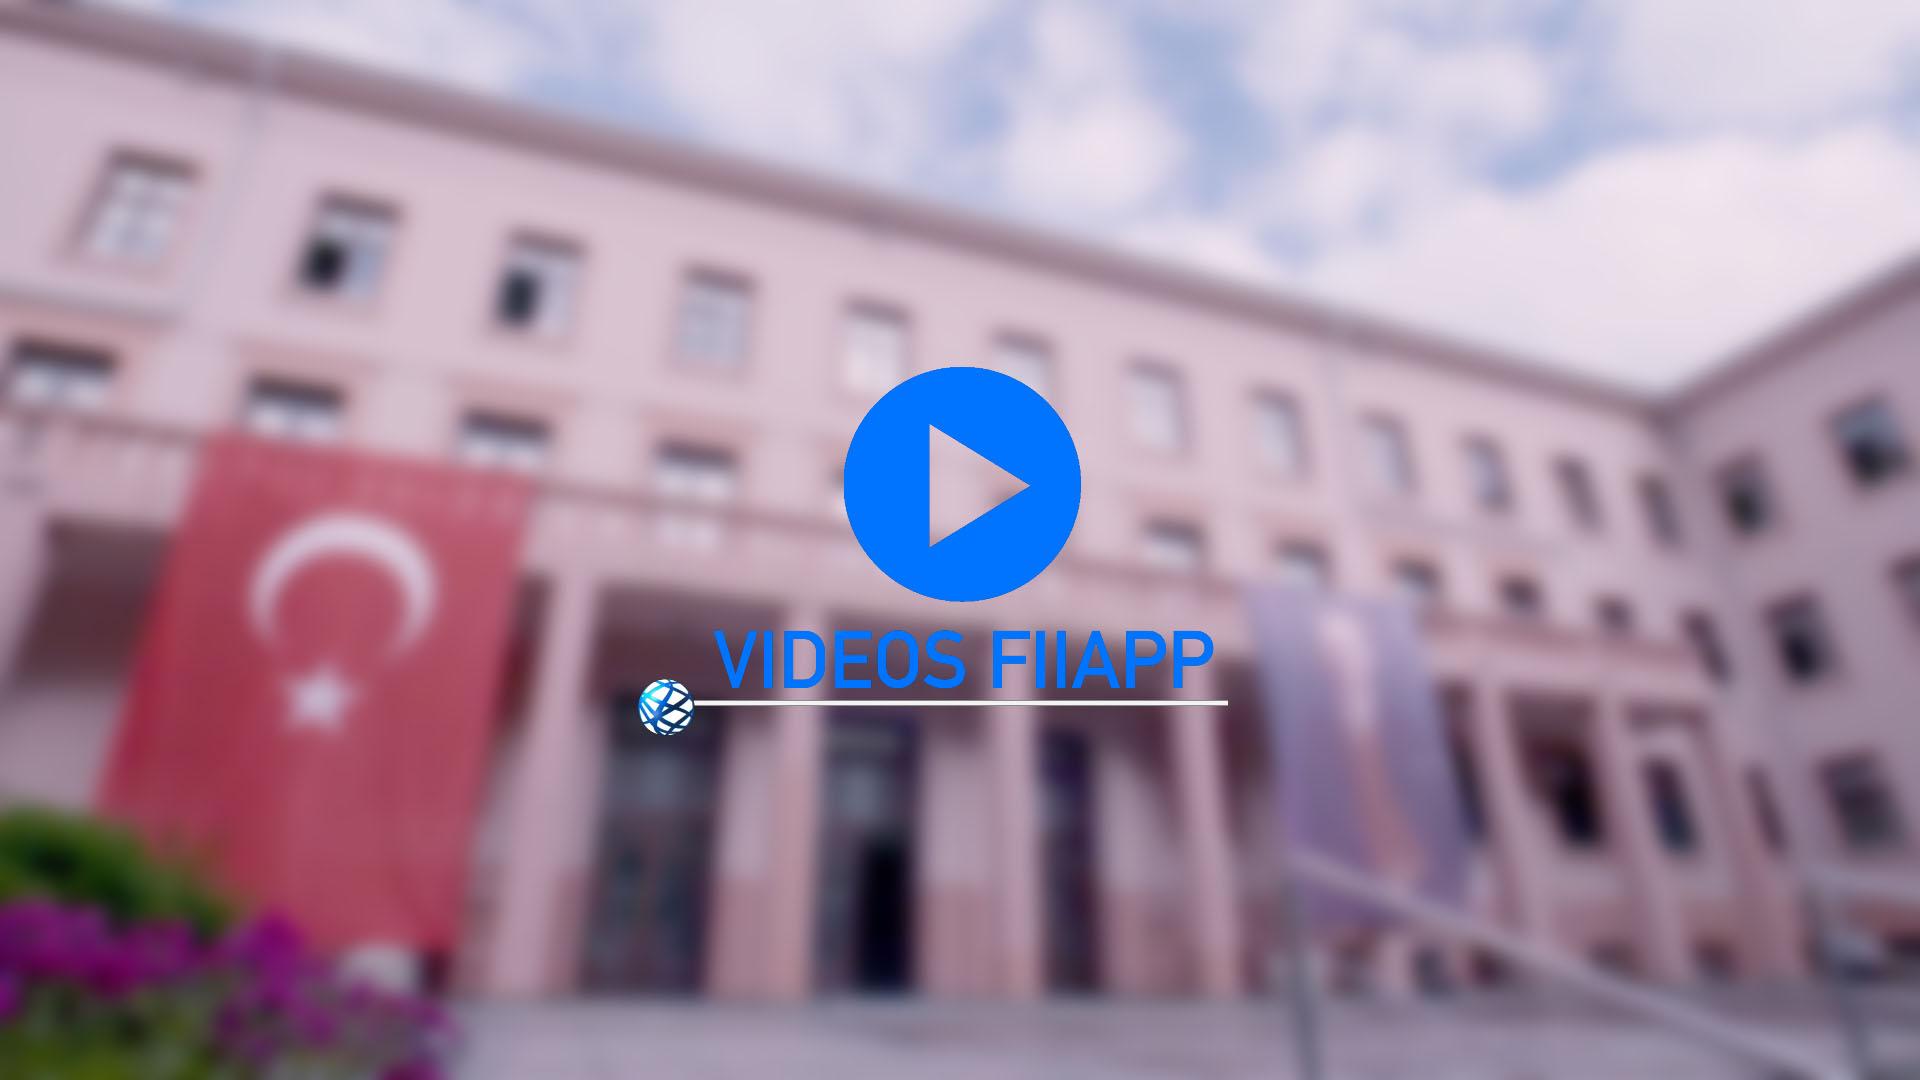 FIIAPP videos: civil enforcement offices in Turkey